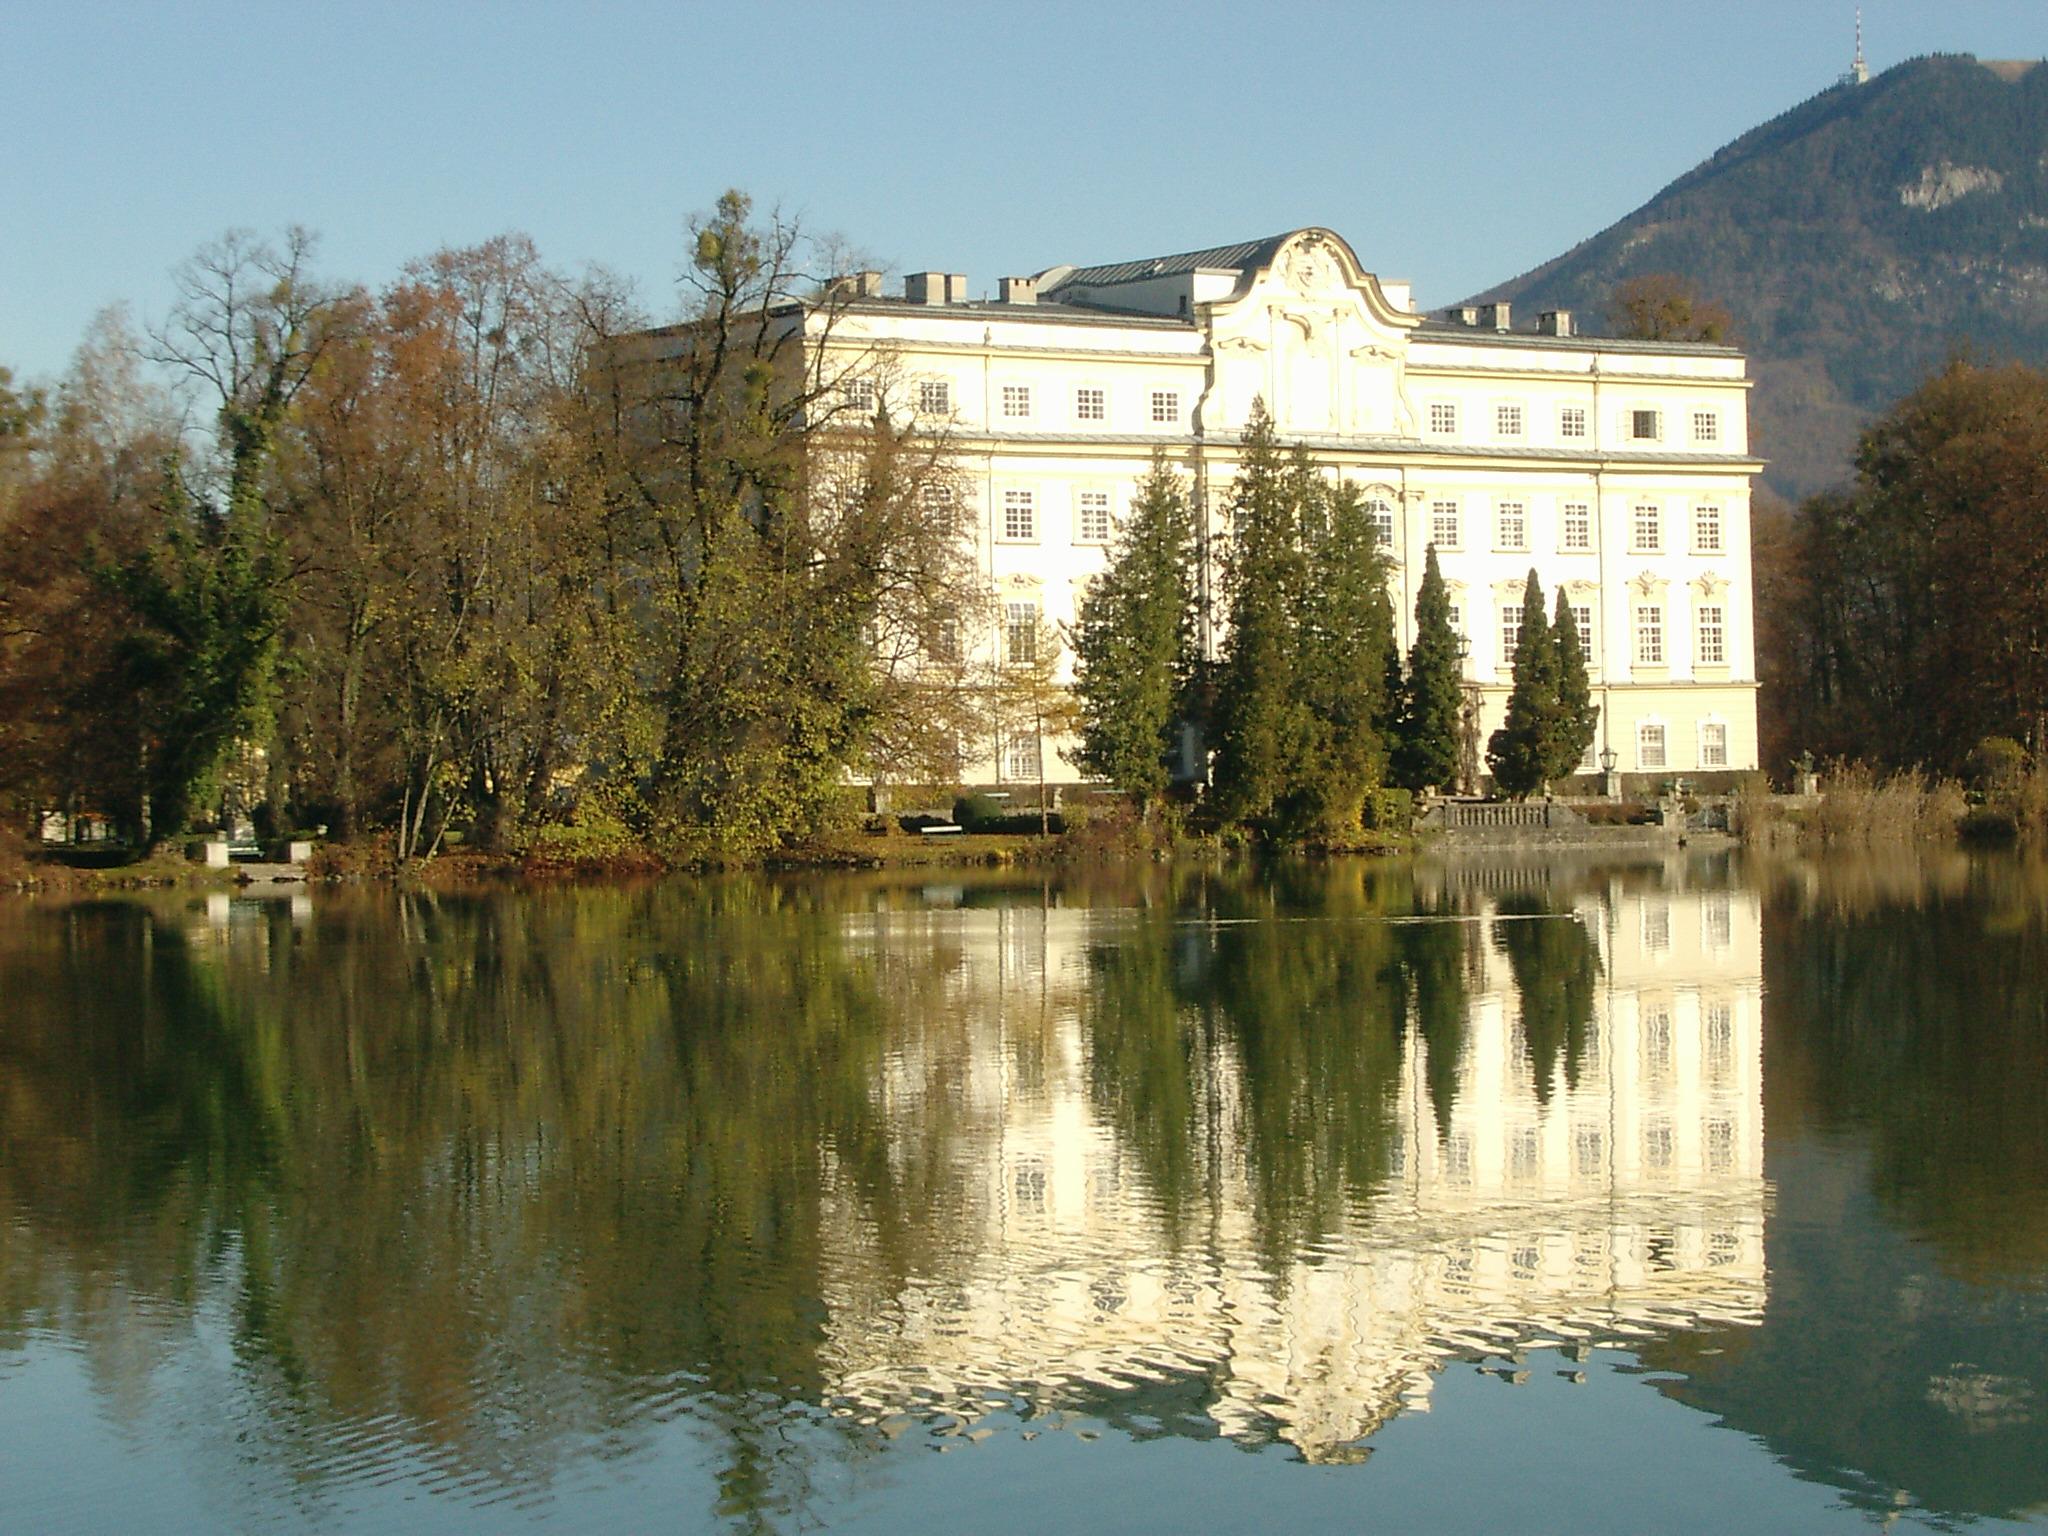 Palácio Schloss Leopoldskron - Áustria imagem: reprodução